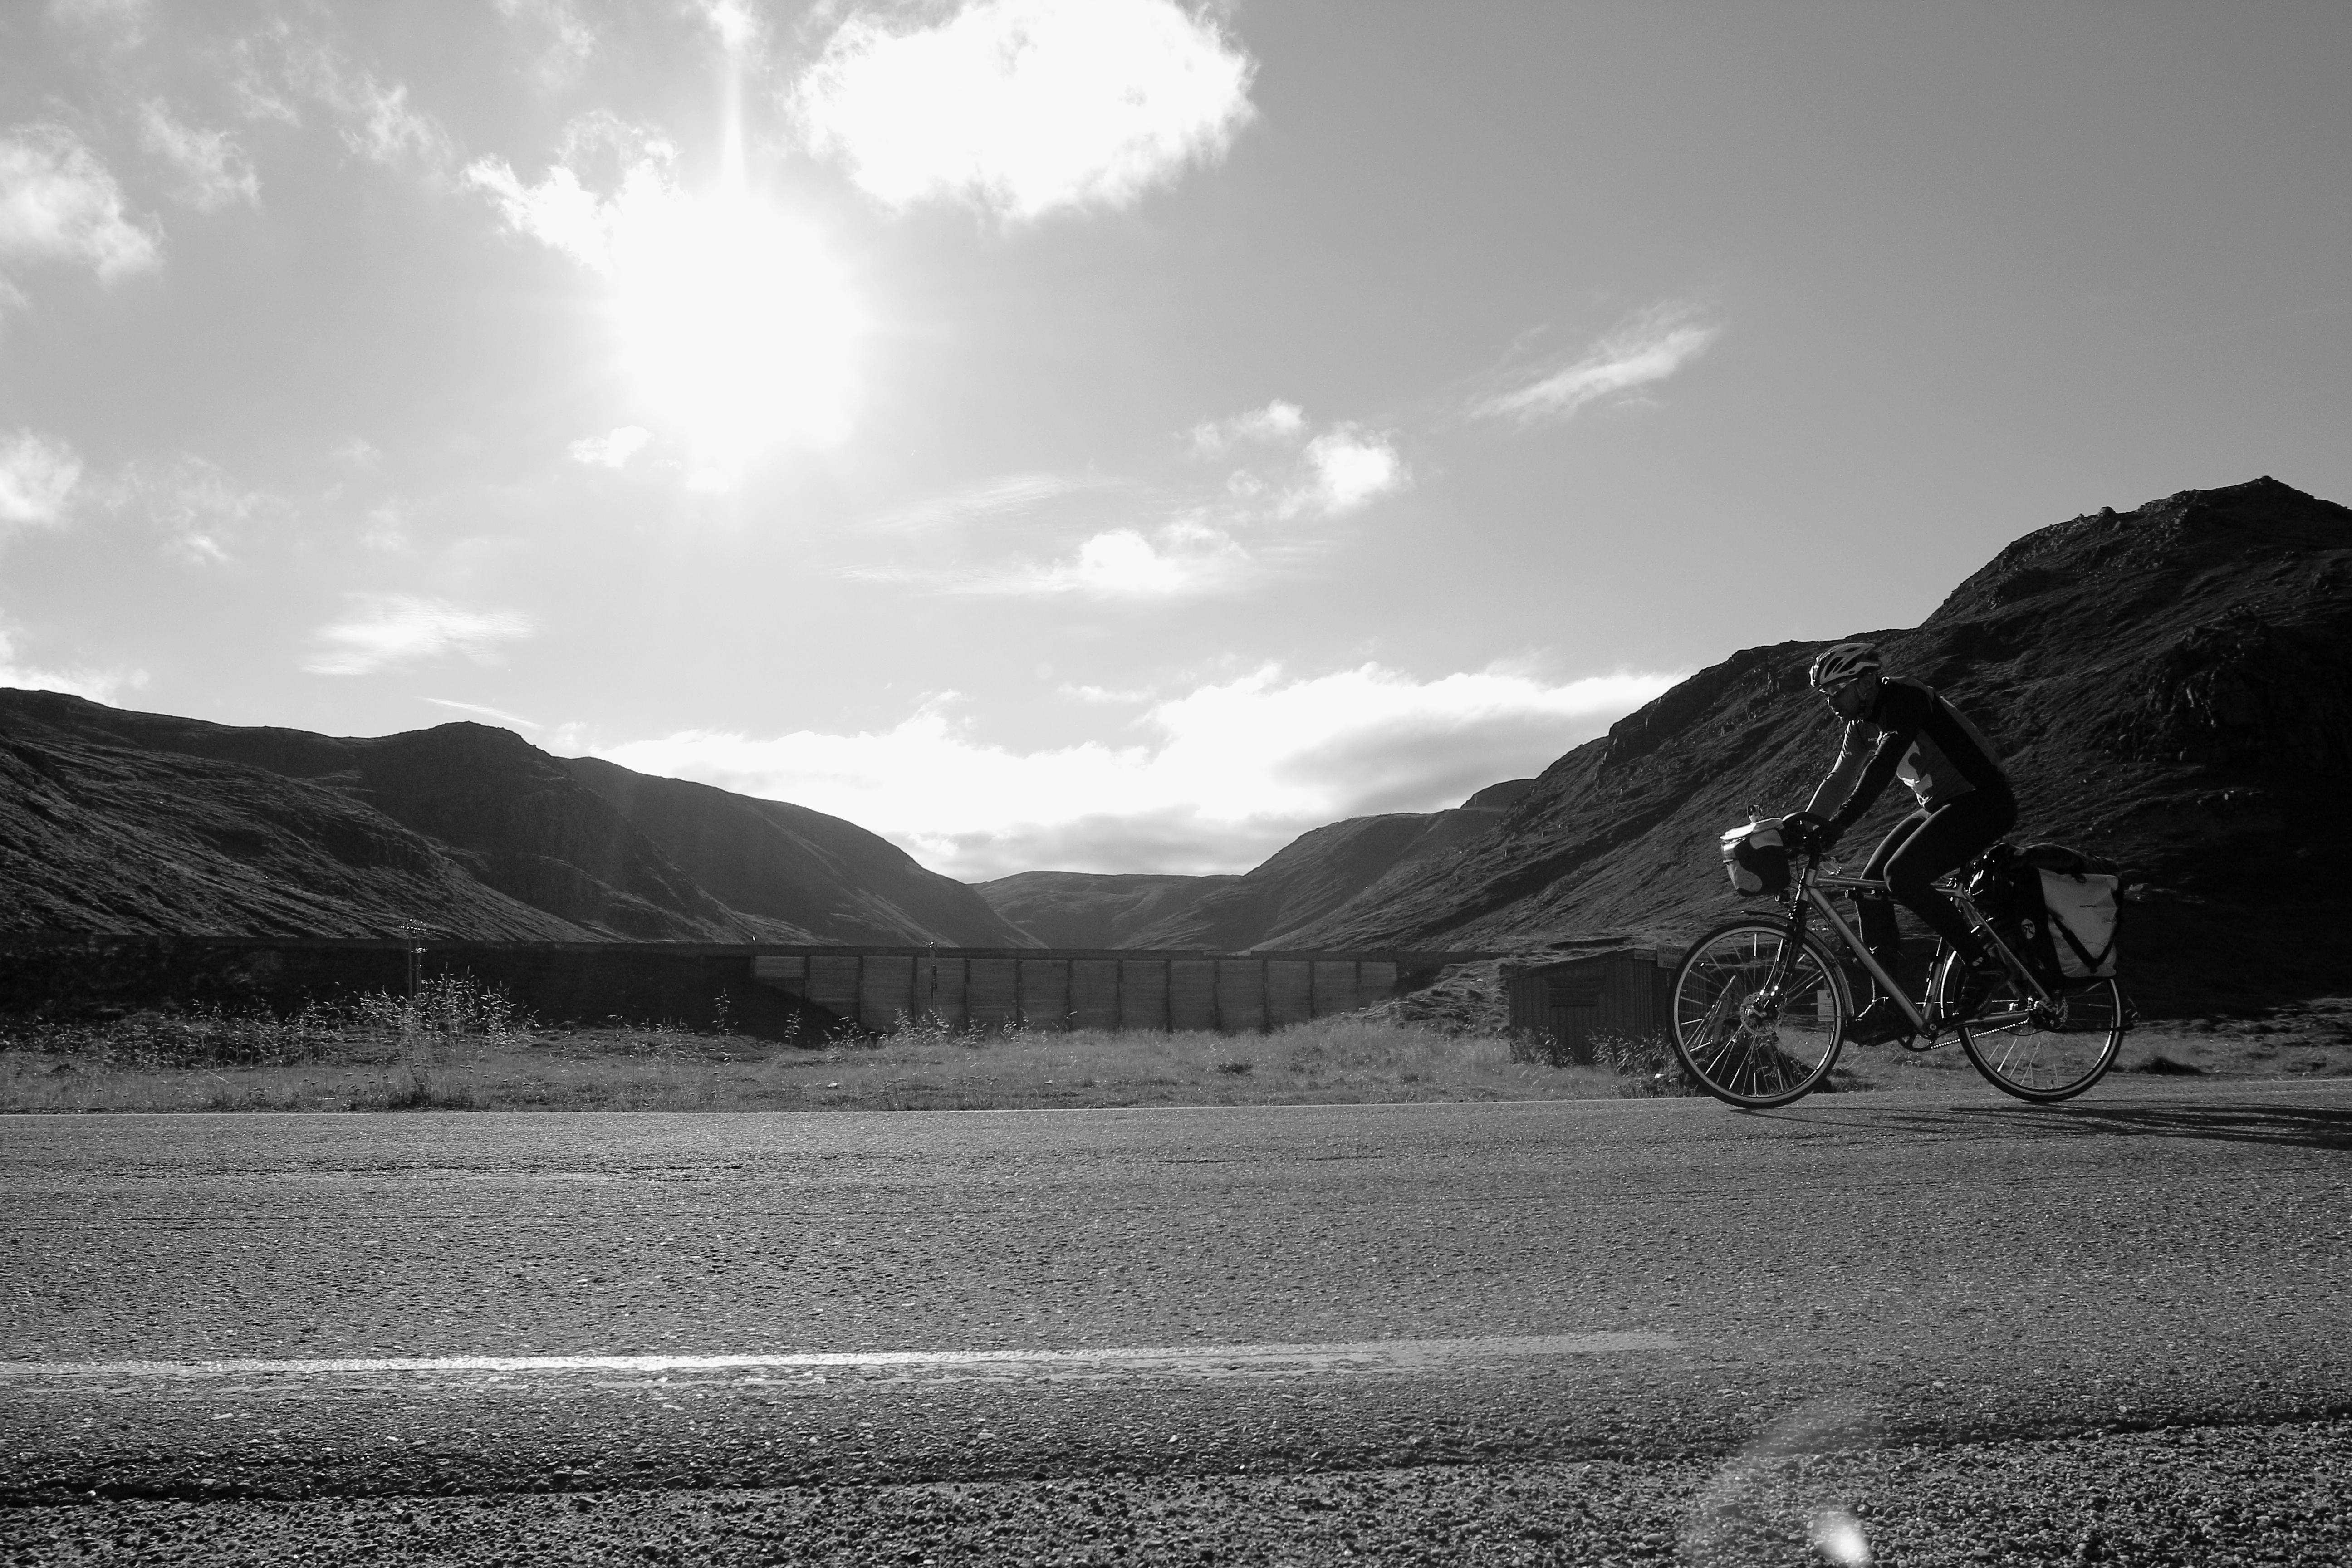 Reza on bike black and white